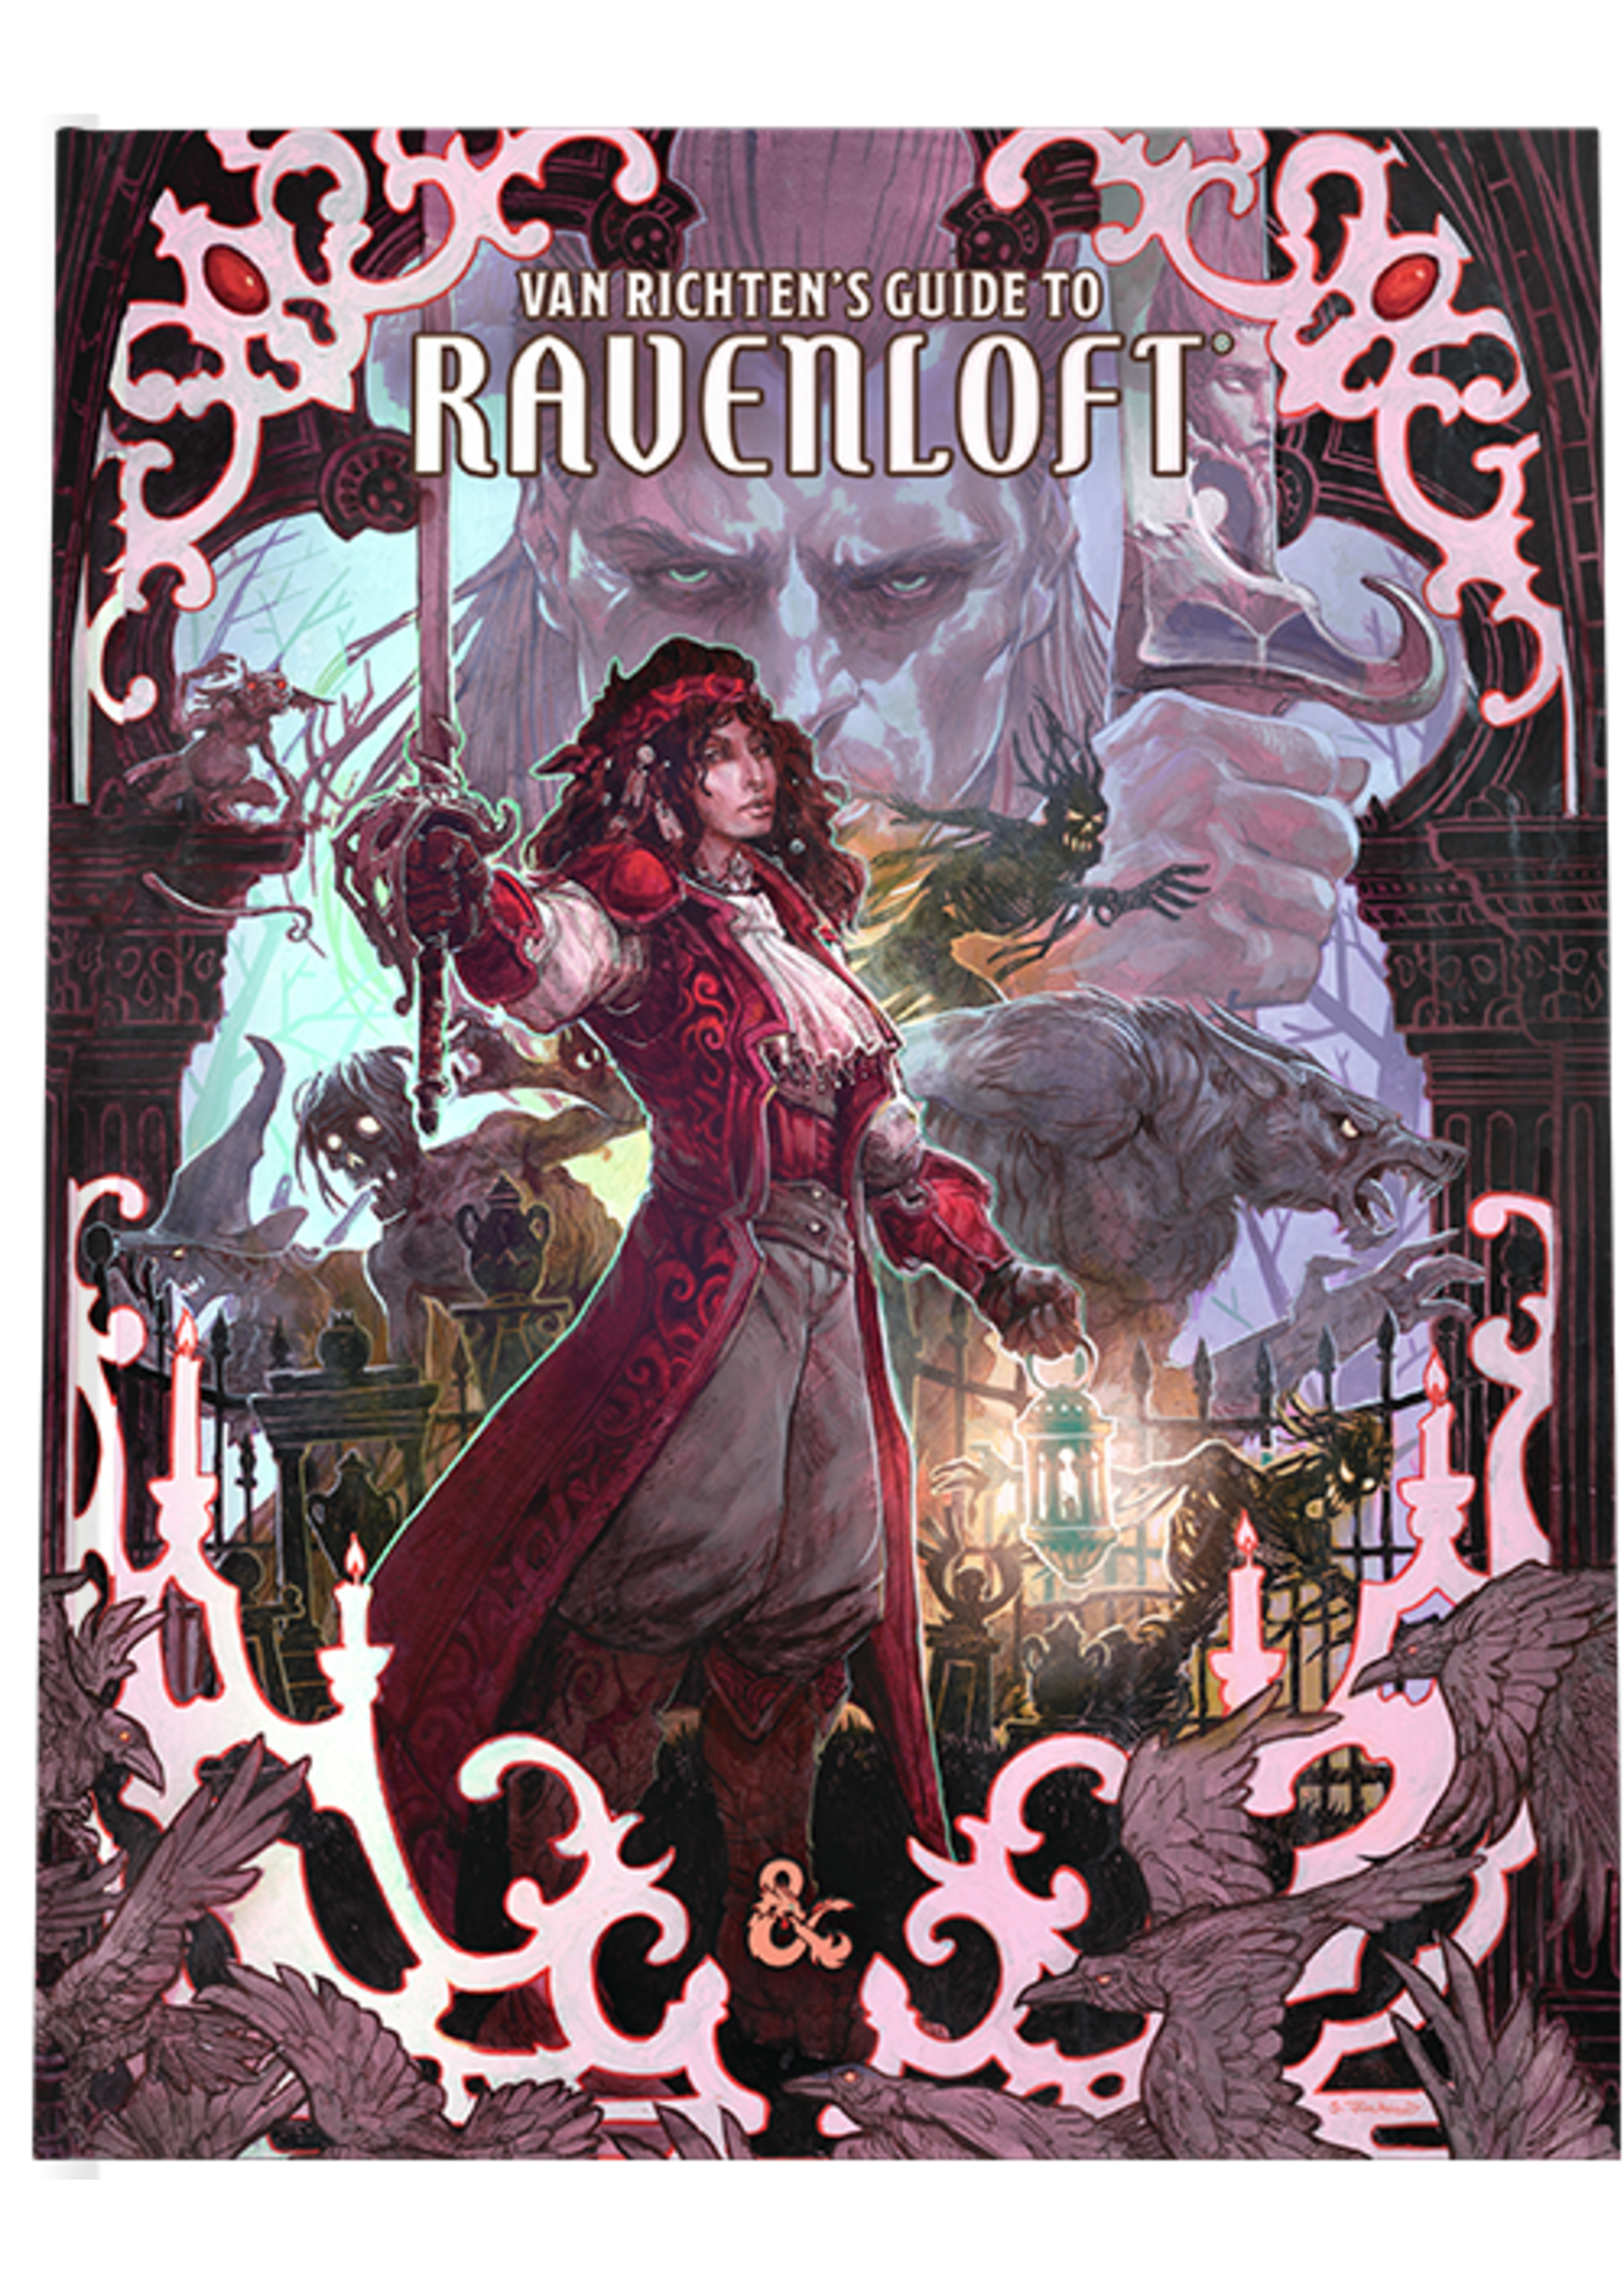 Dungeons & Dragons RPG: Van Richten's Guide to Ravenloft - Alt Cover (Pre-Order)